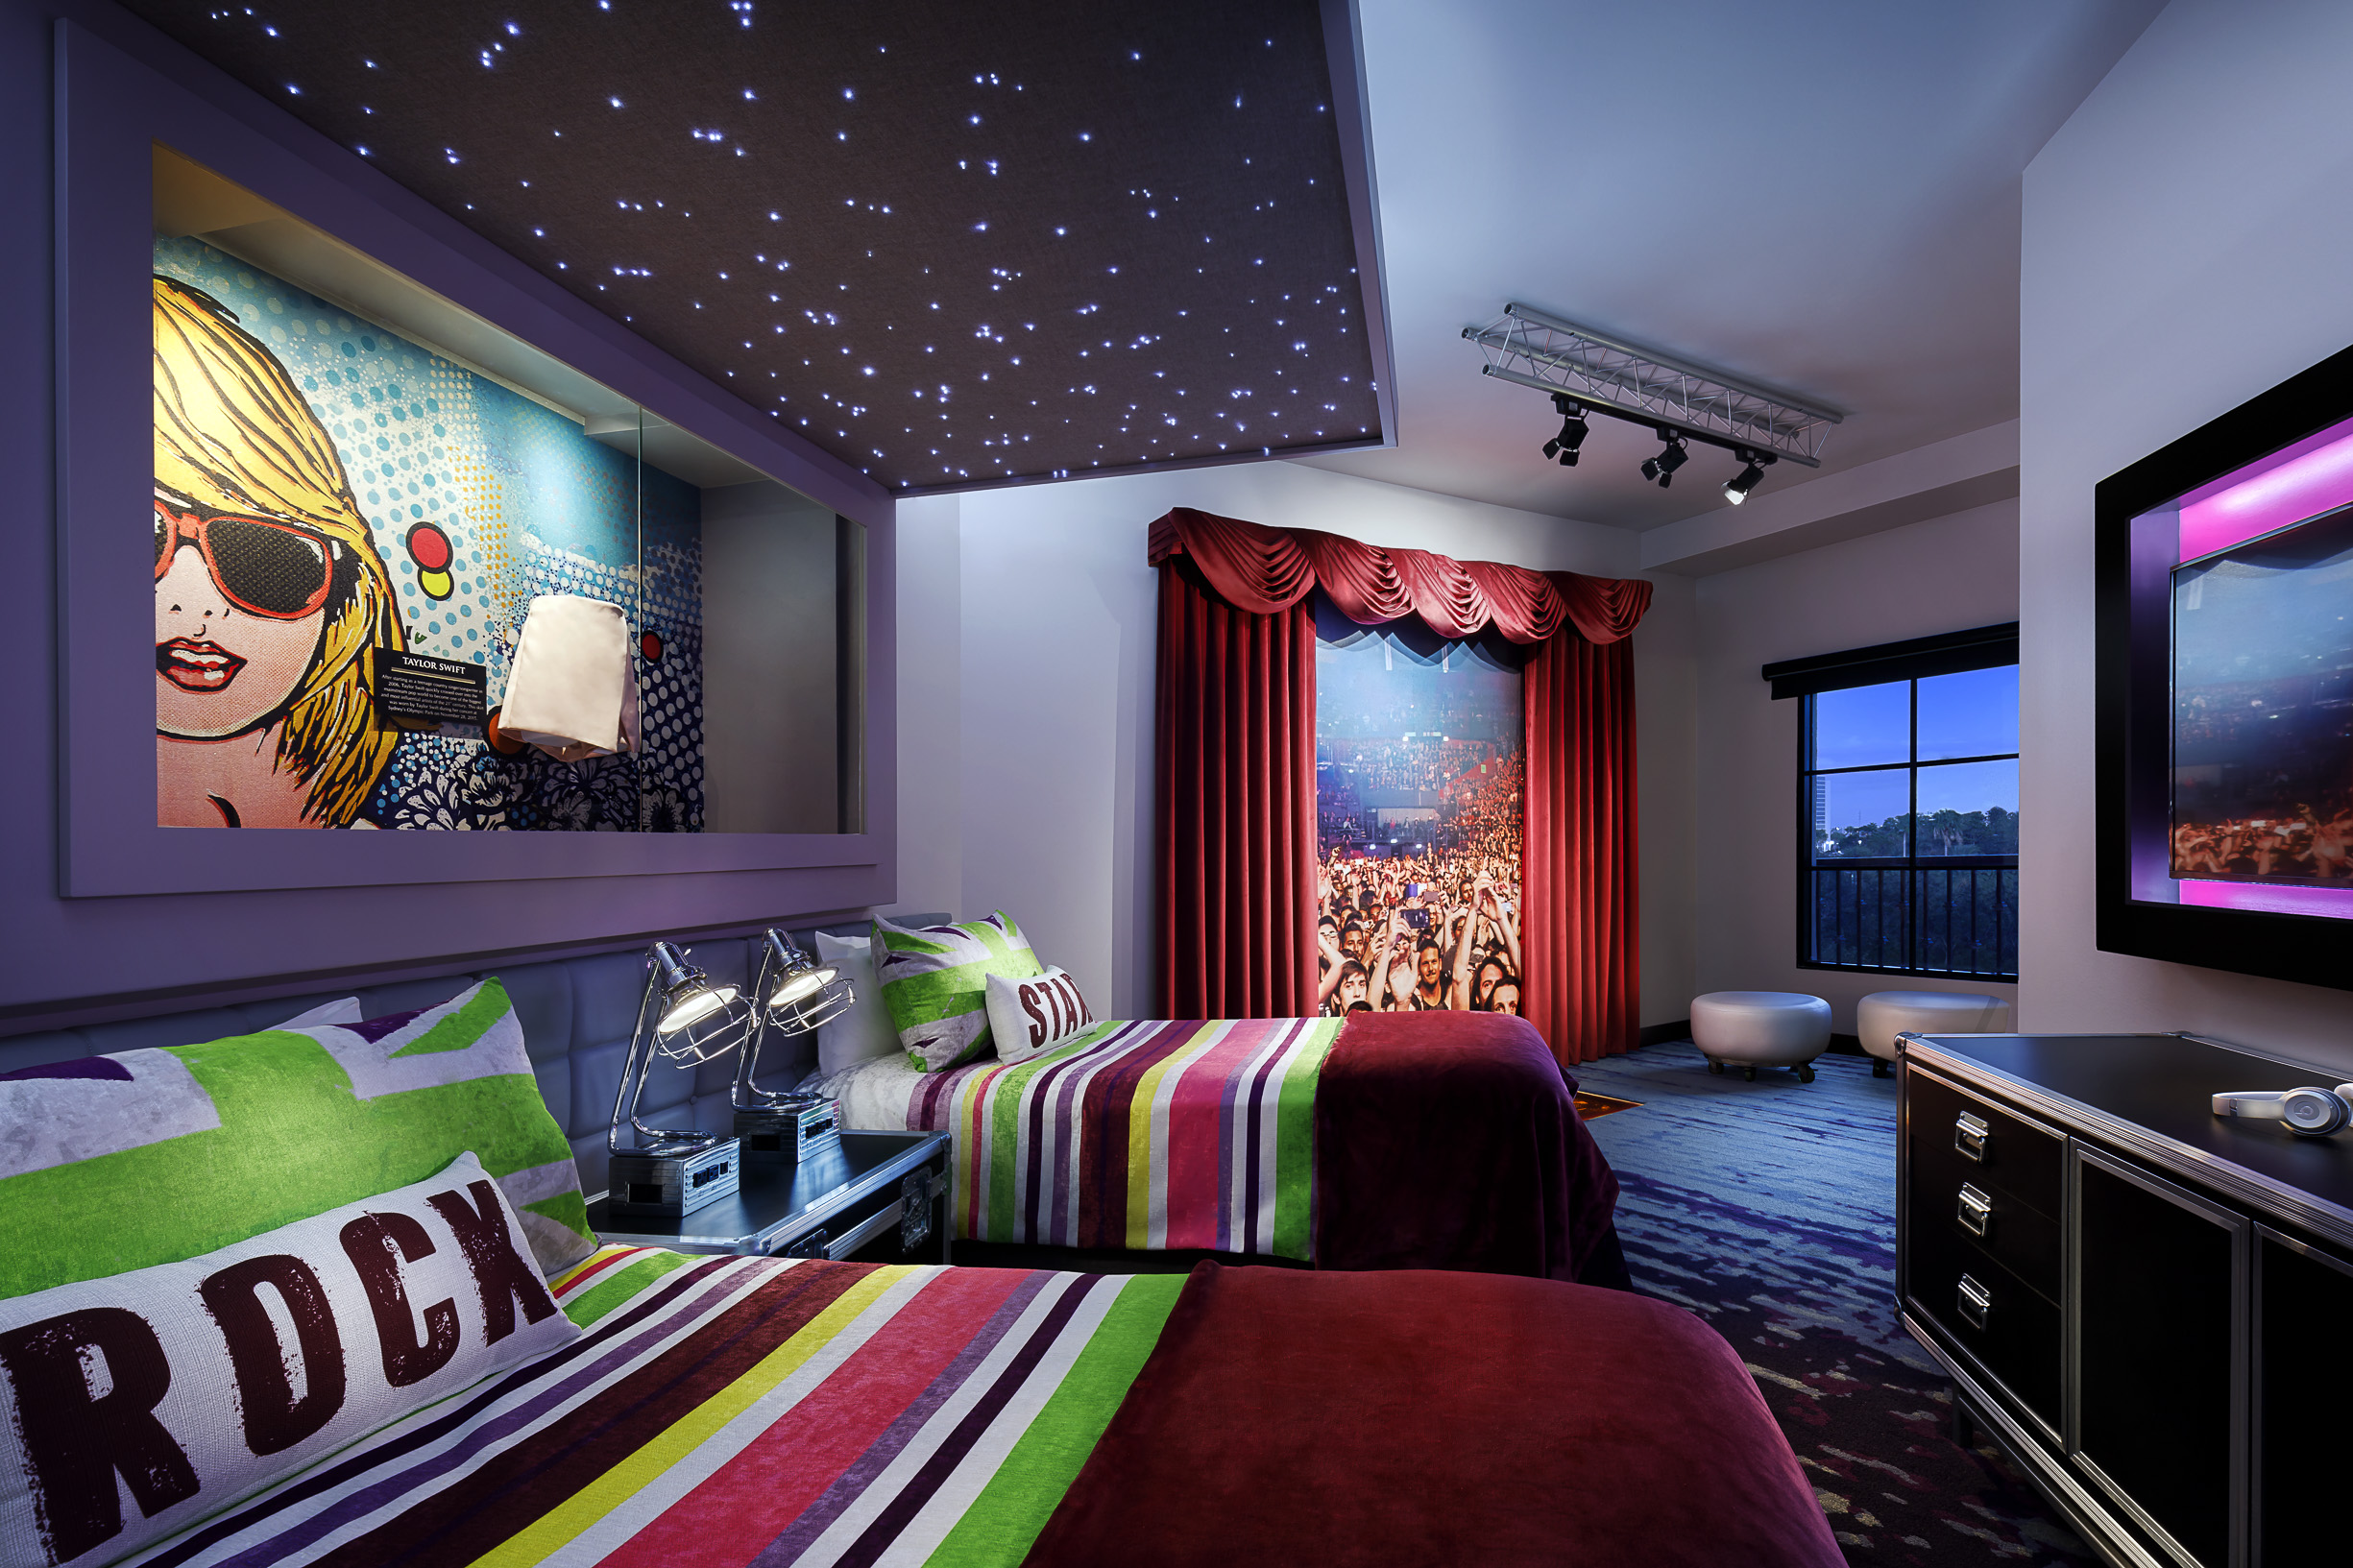 39 future rock star 39 family suites debut at hard rock hotel - 2 bedroom hotel suites in orlando fl ...